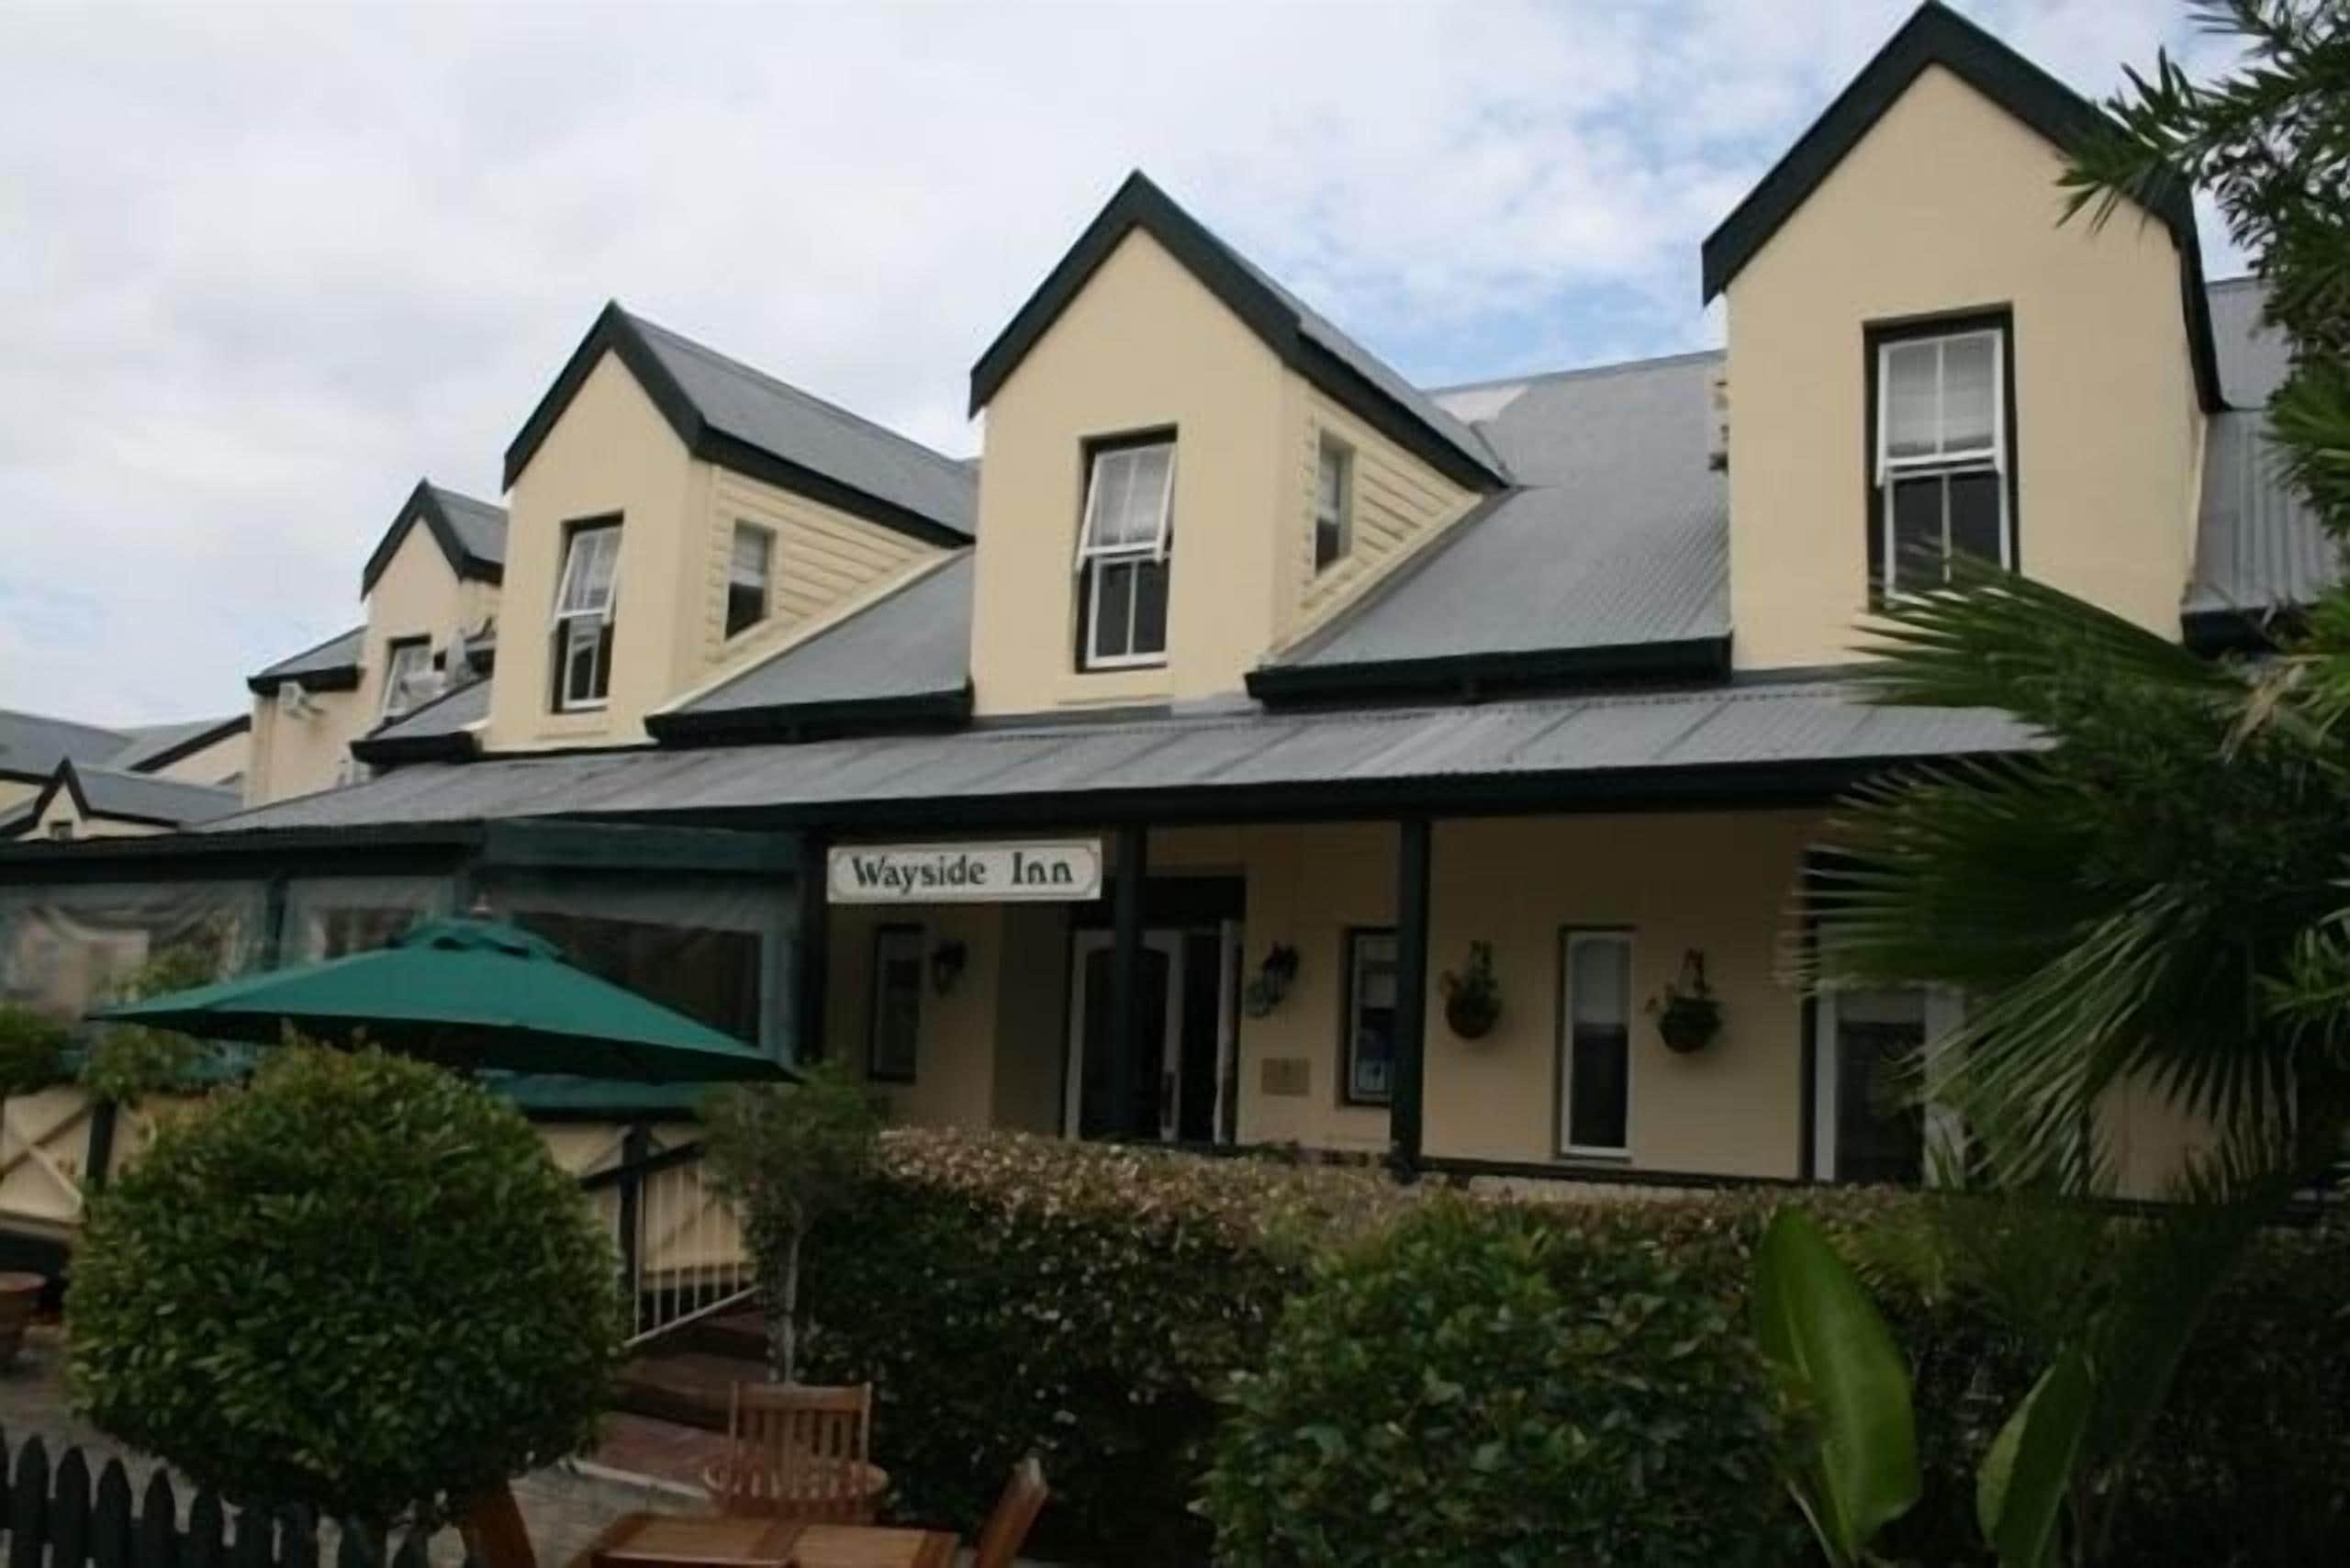 Wayside Inn